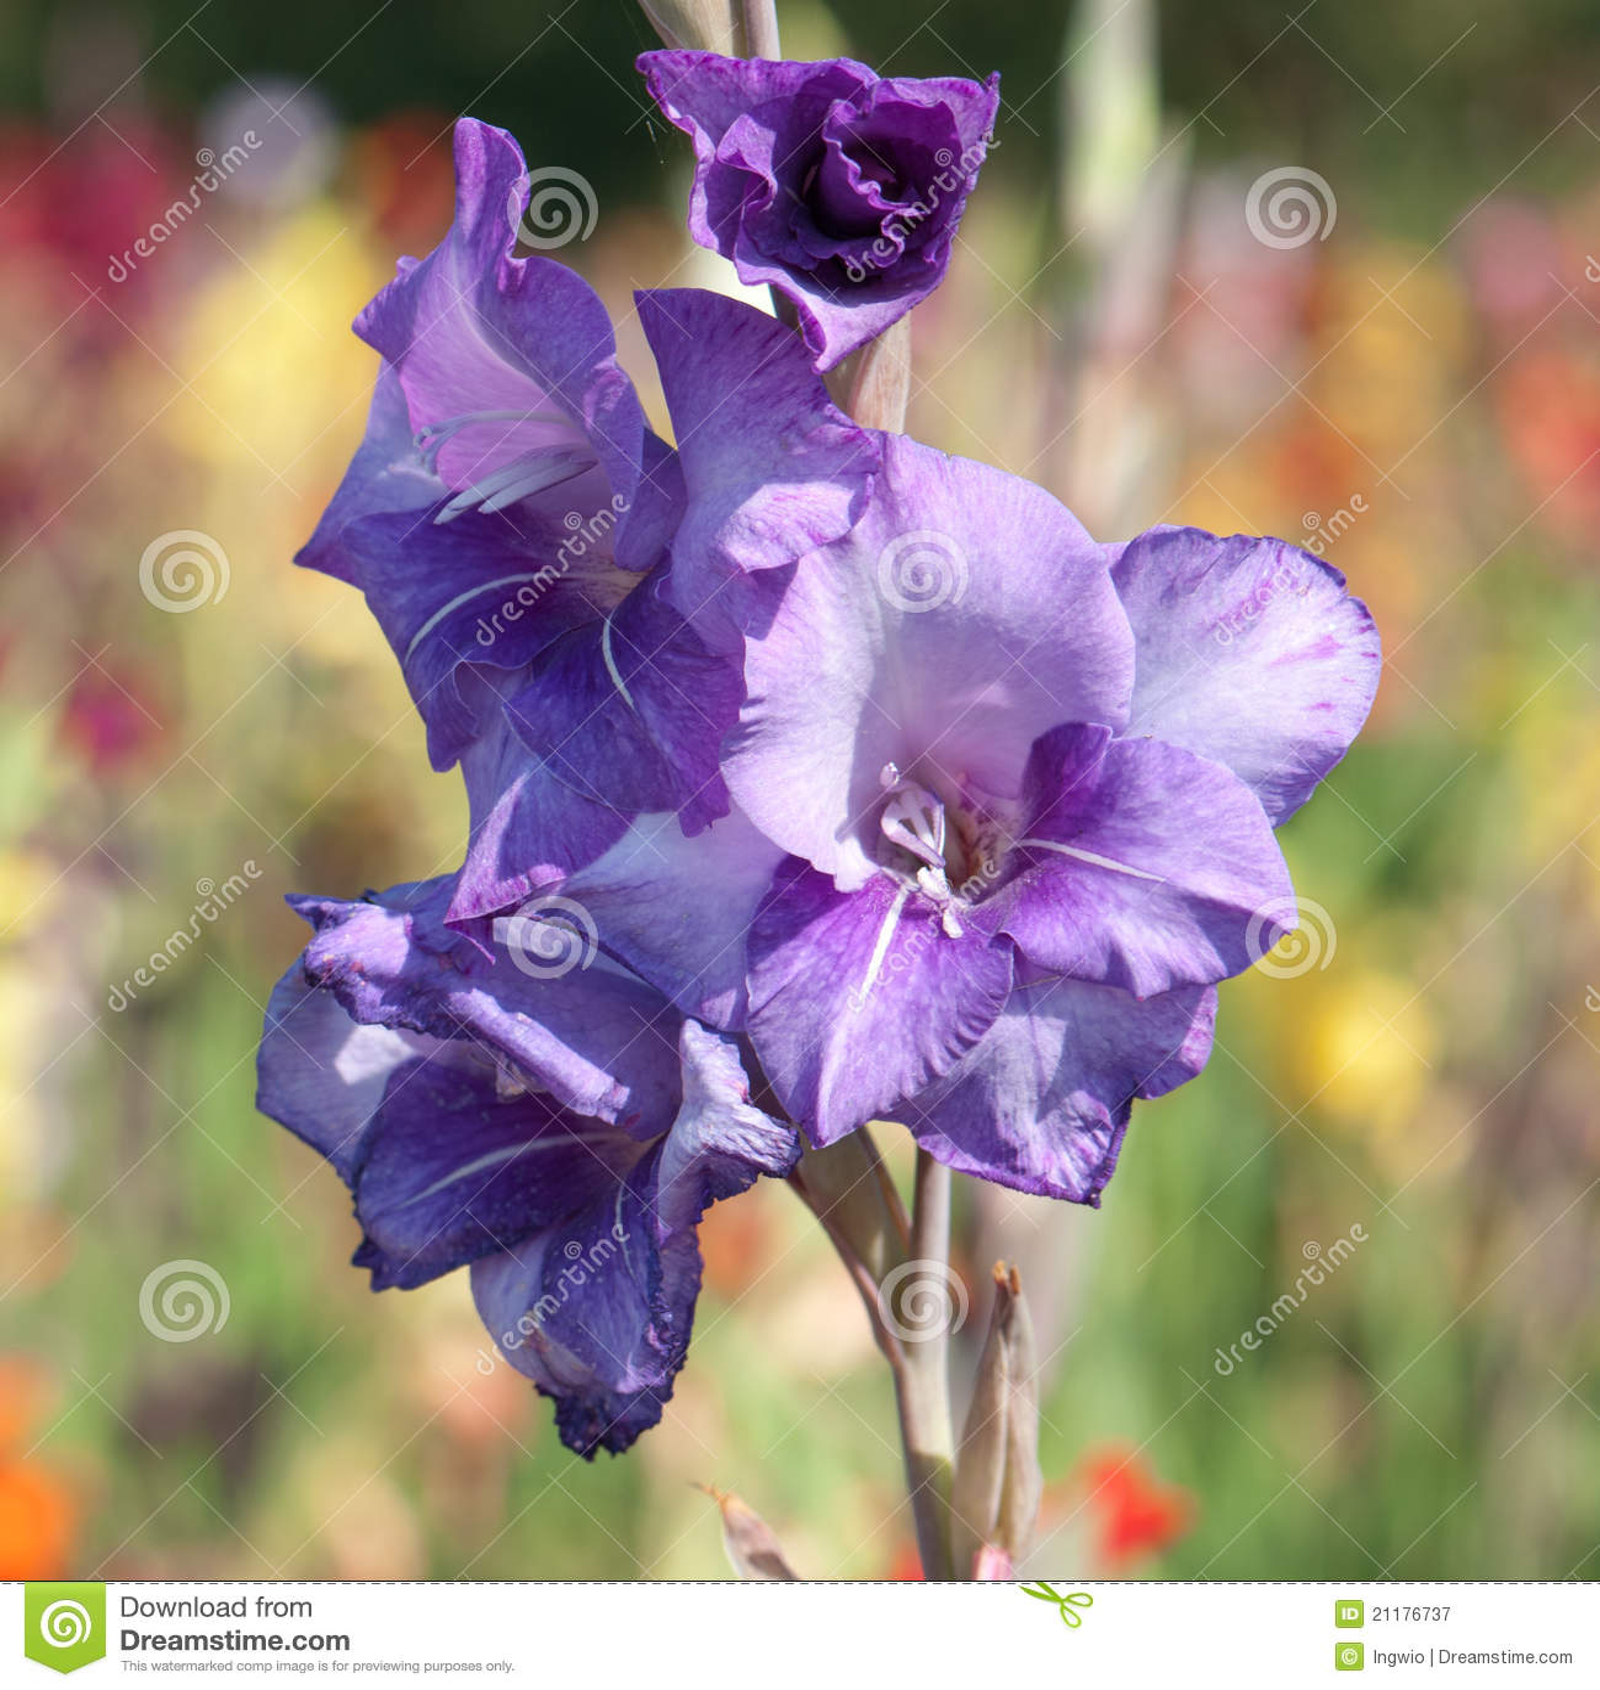 Flowers of a blue gladiolus